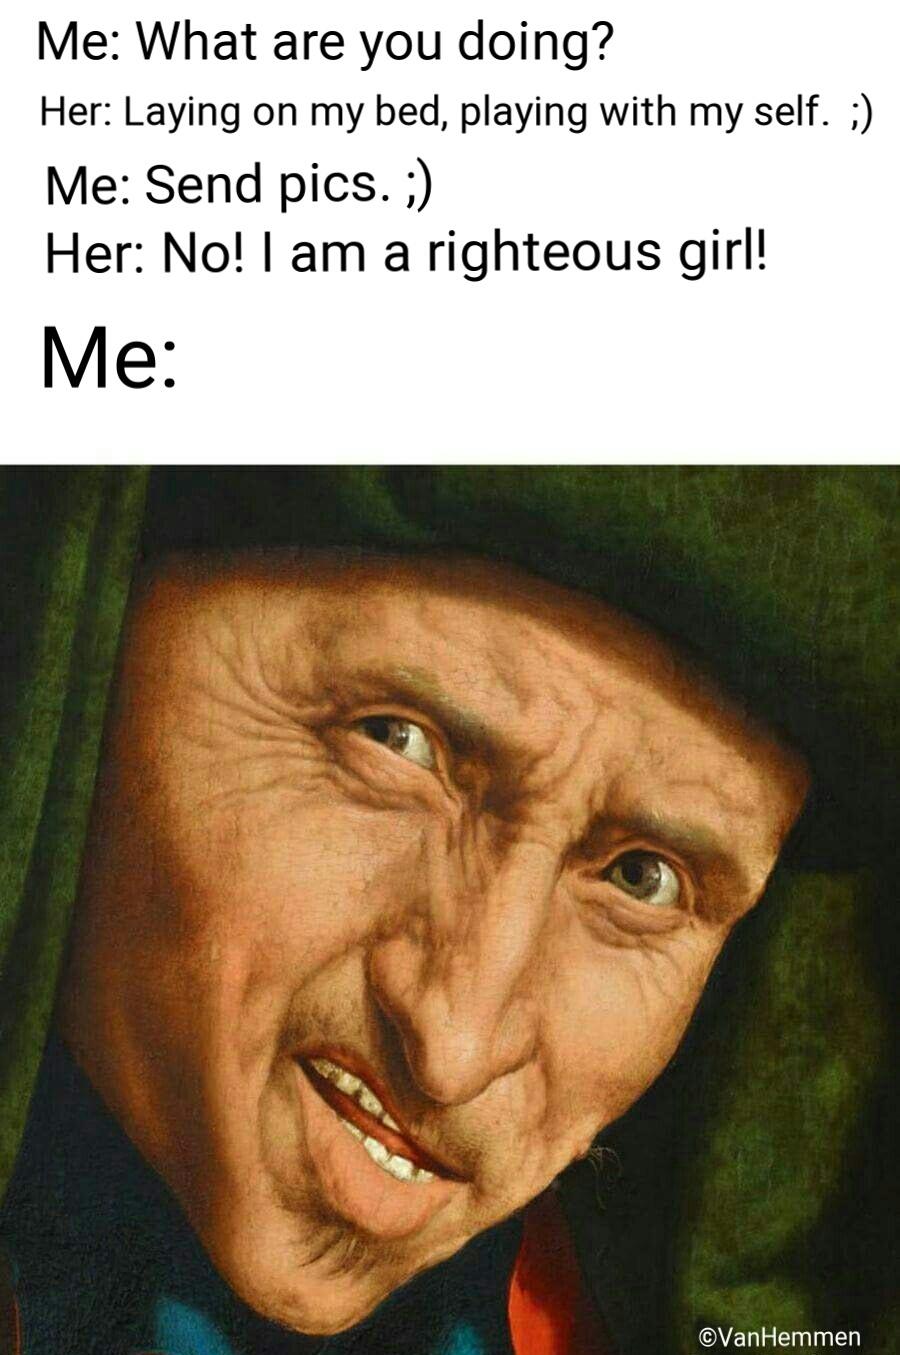 Titel is obvious. - meme